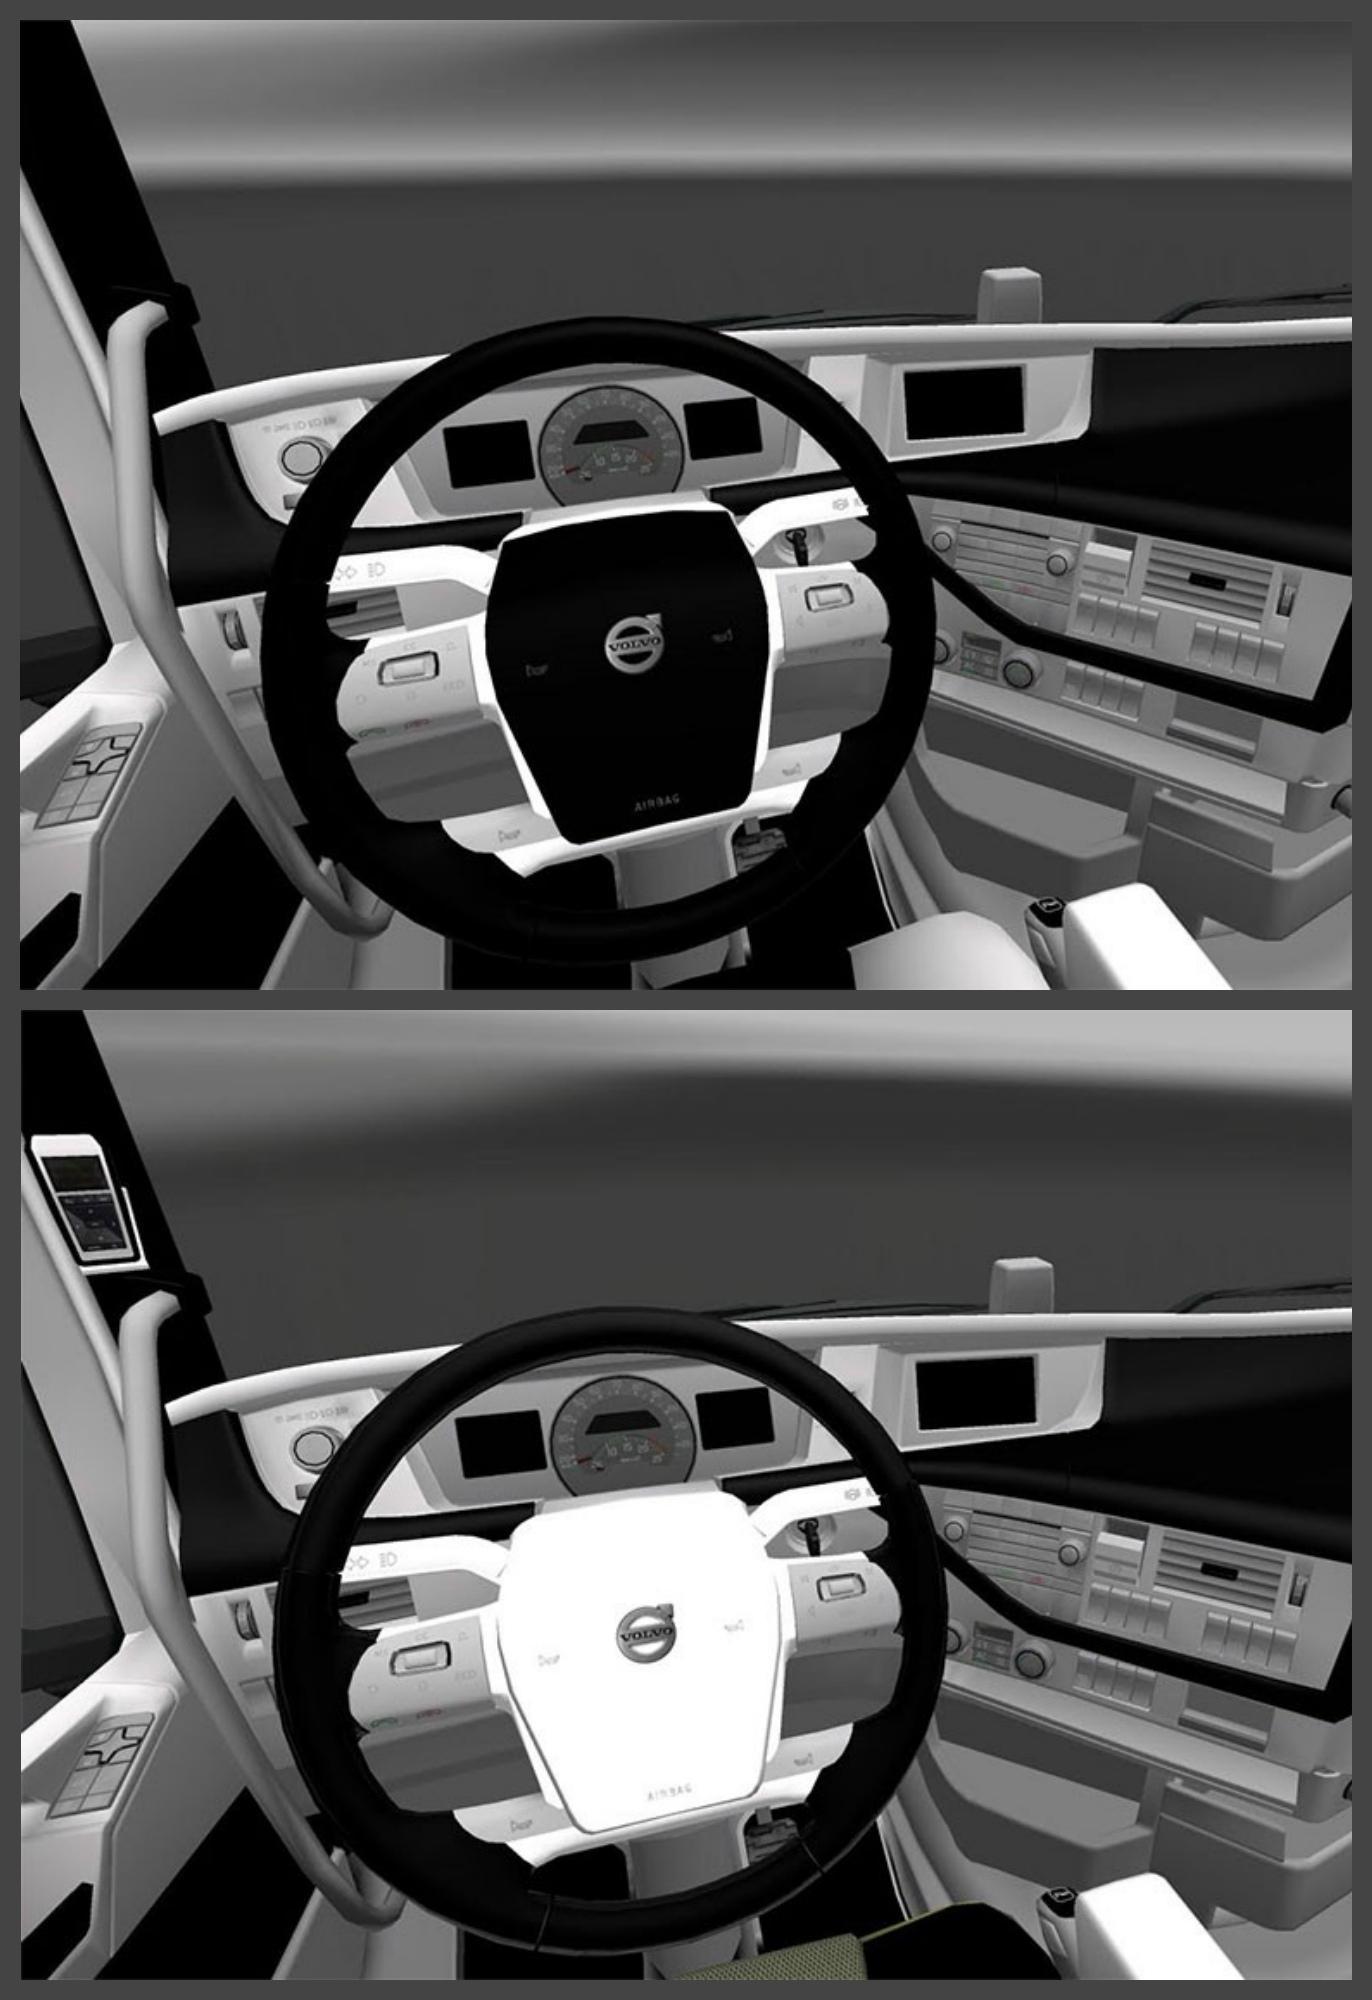 fh2012-black-and-white-interior-1-23_1